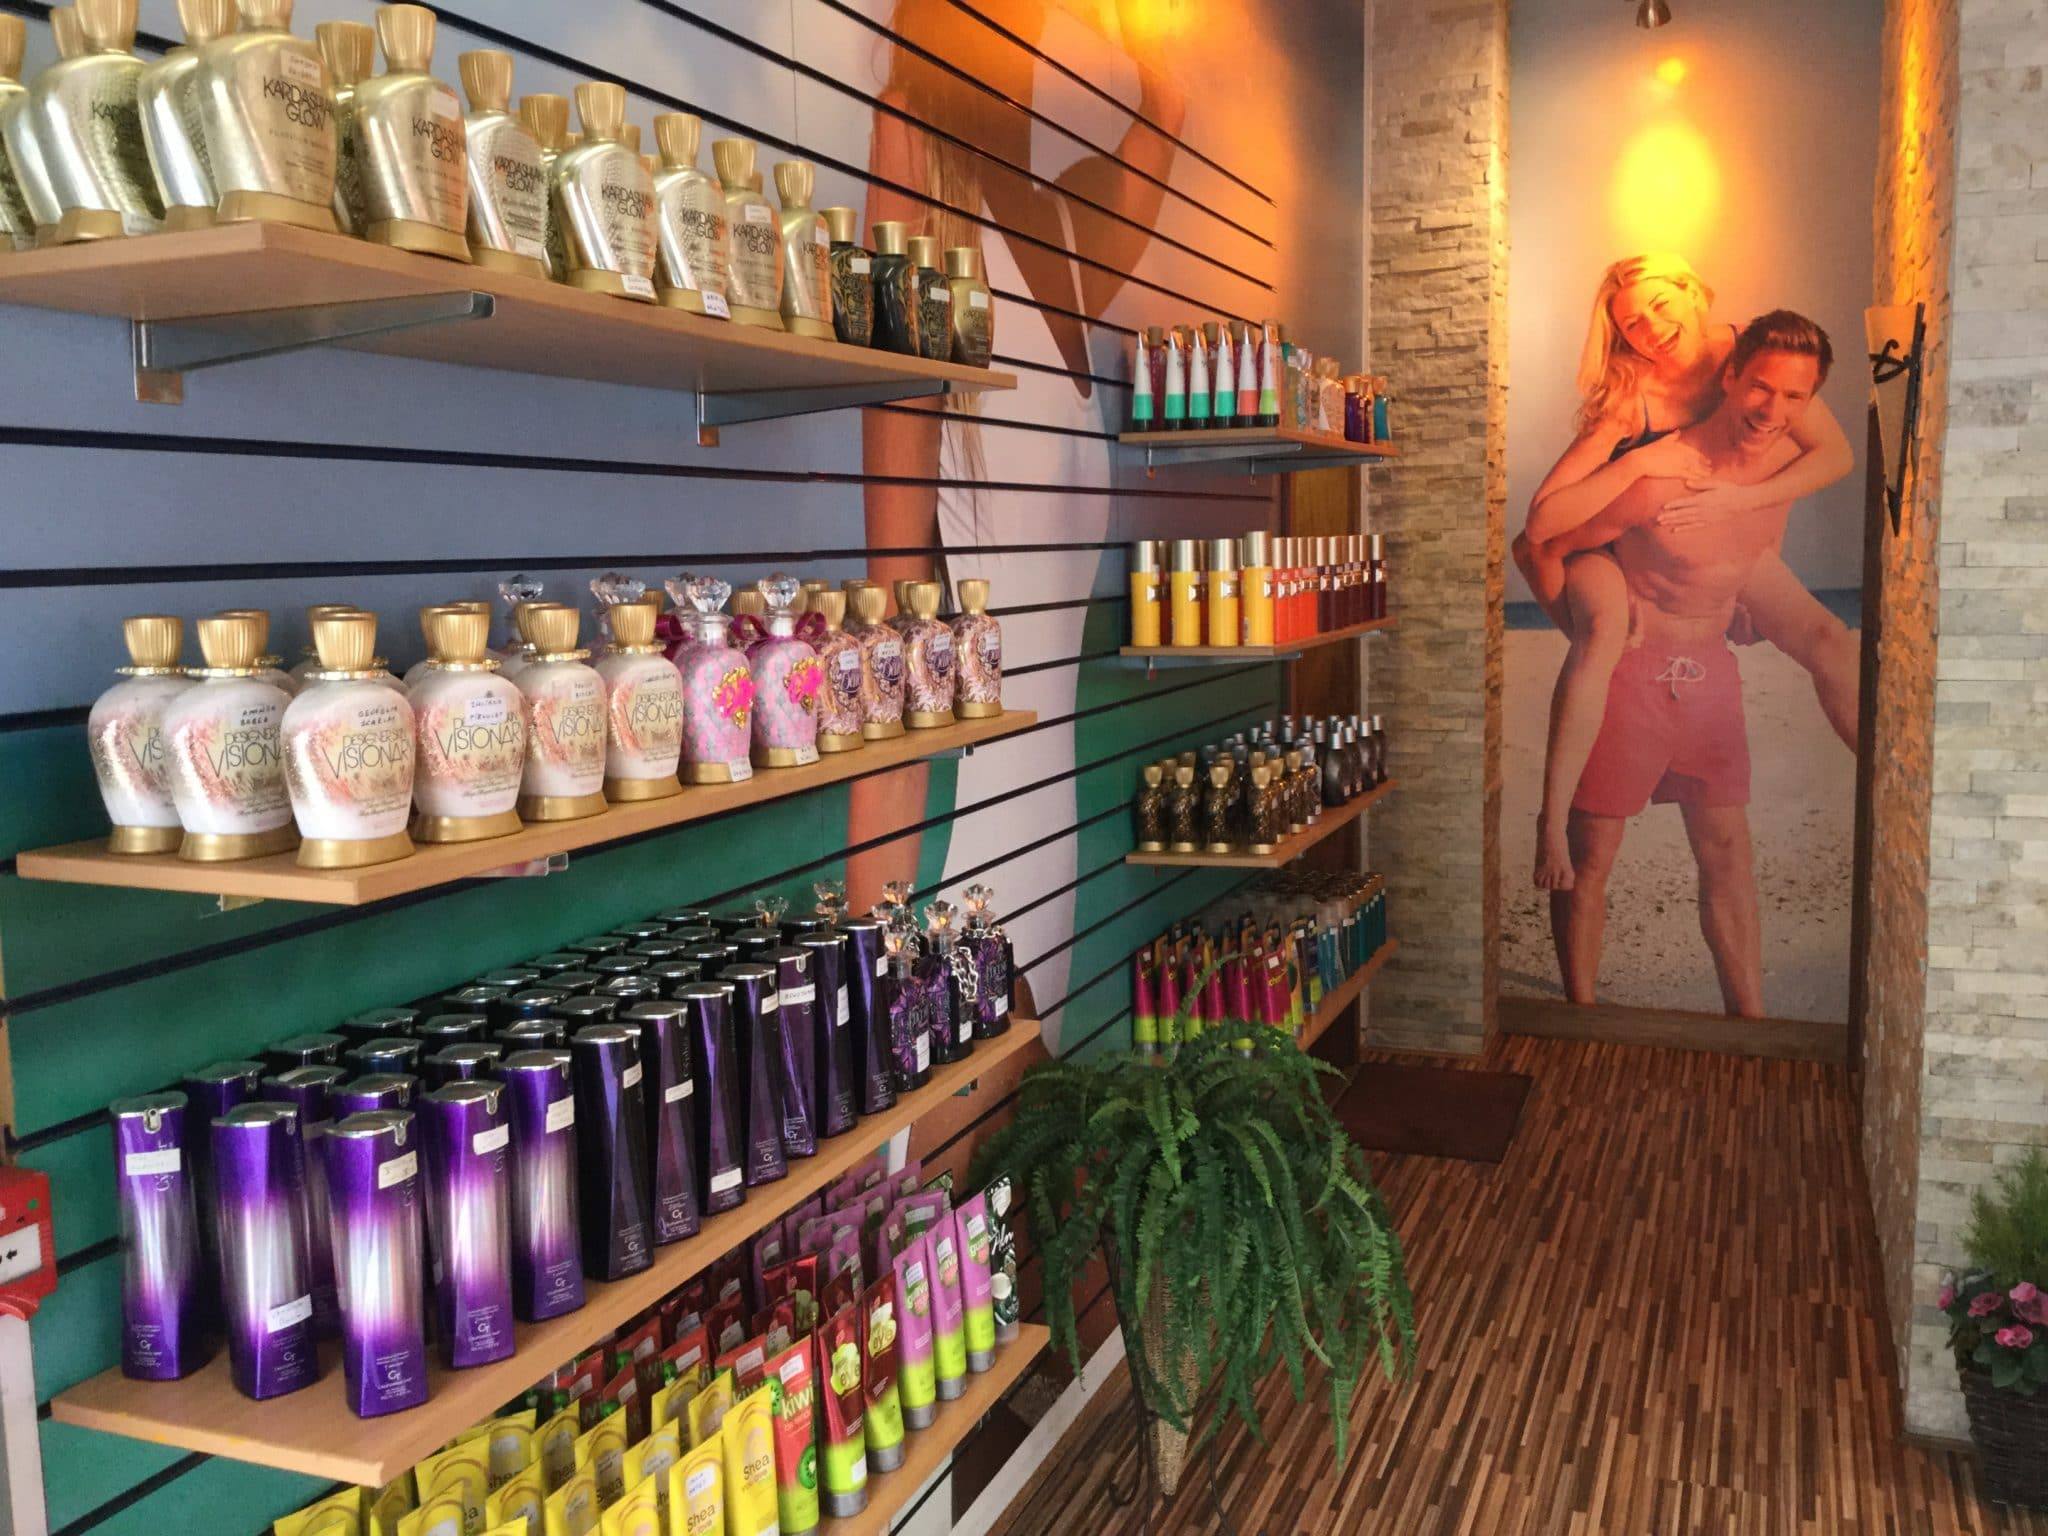 The Tanning Shop Praed Street/ Paddington - The Tanning Shop